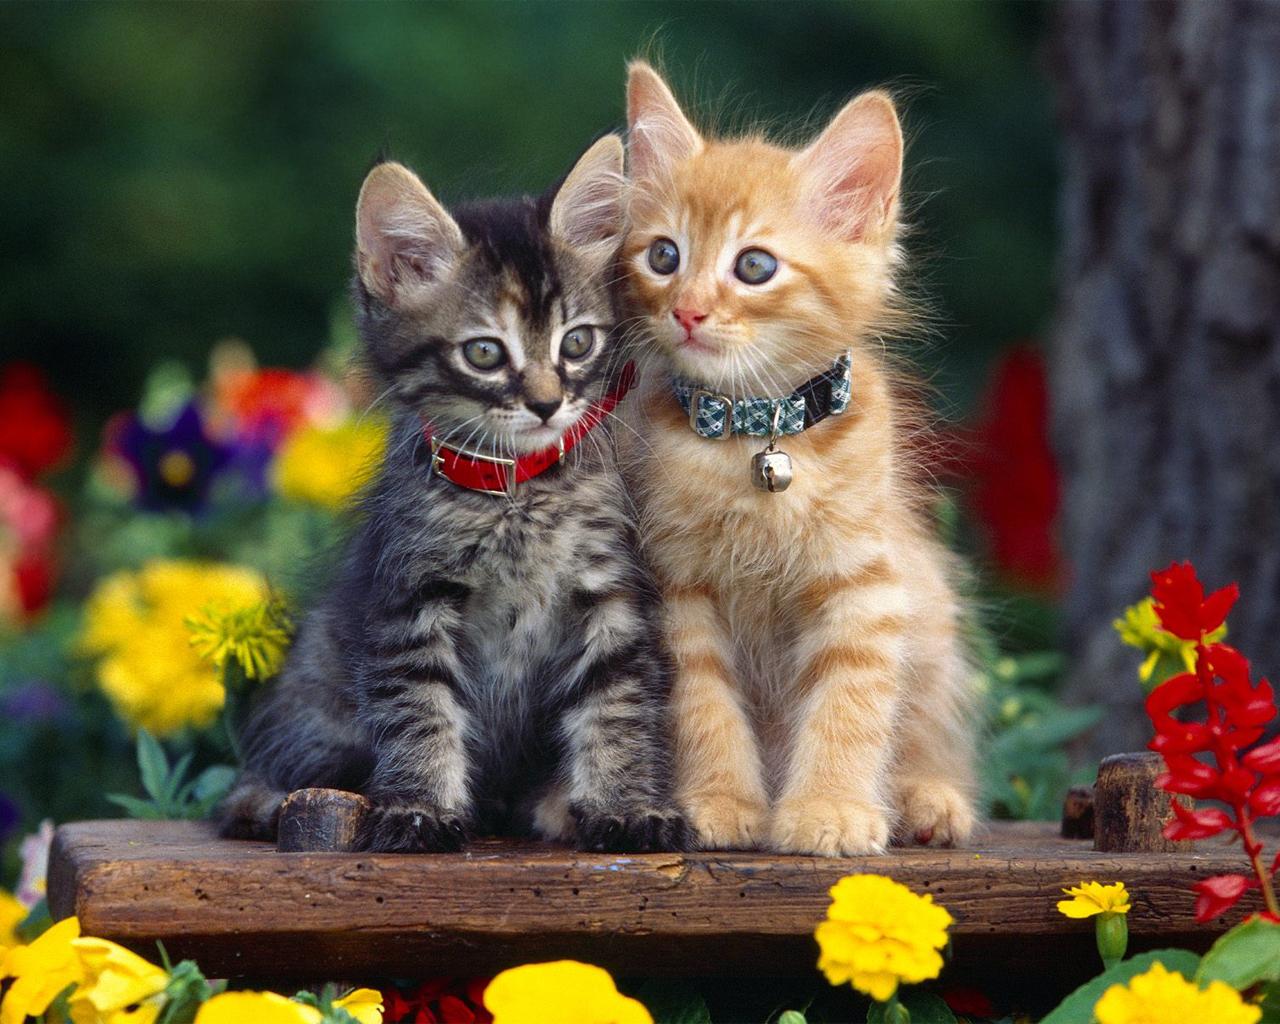 image - 1265530724 cats-wallpaper-cats-5194876-1280-1024 | koror